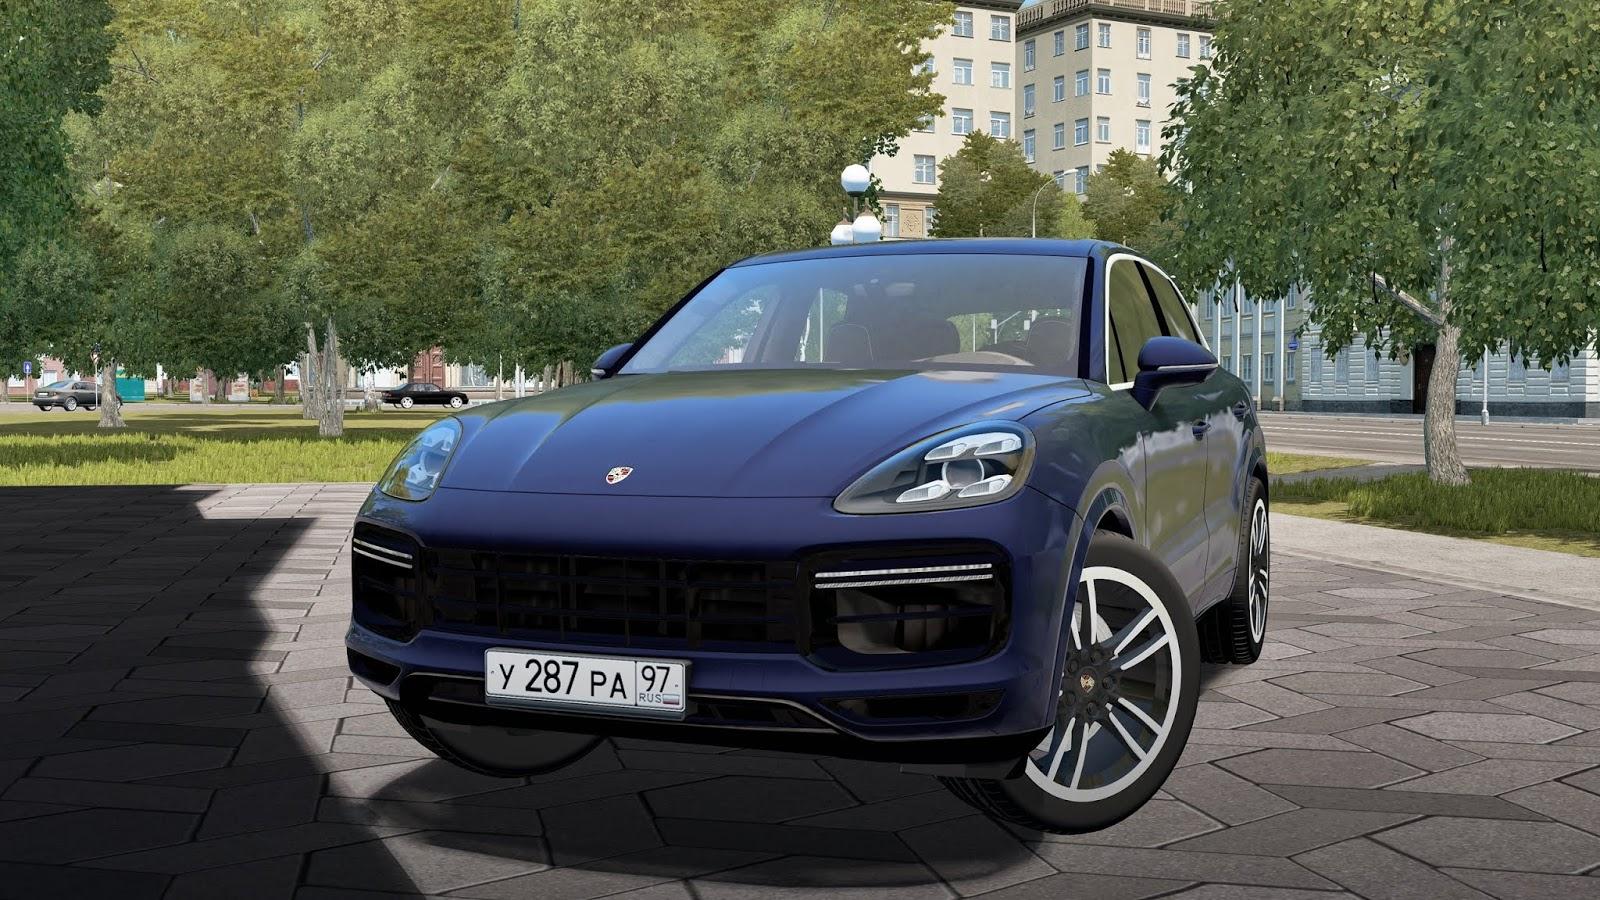 2019 Porsche Cayenne Turbo City Car Driving 1 5 7 Mod